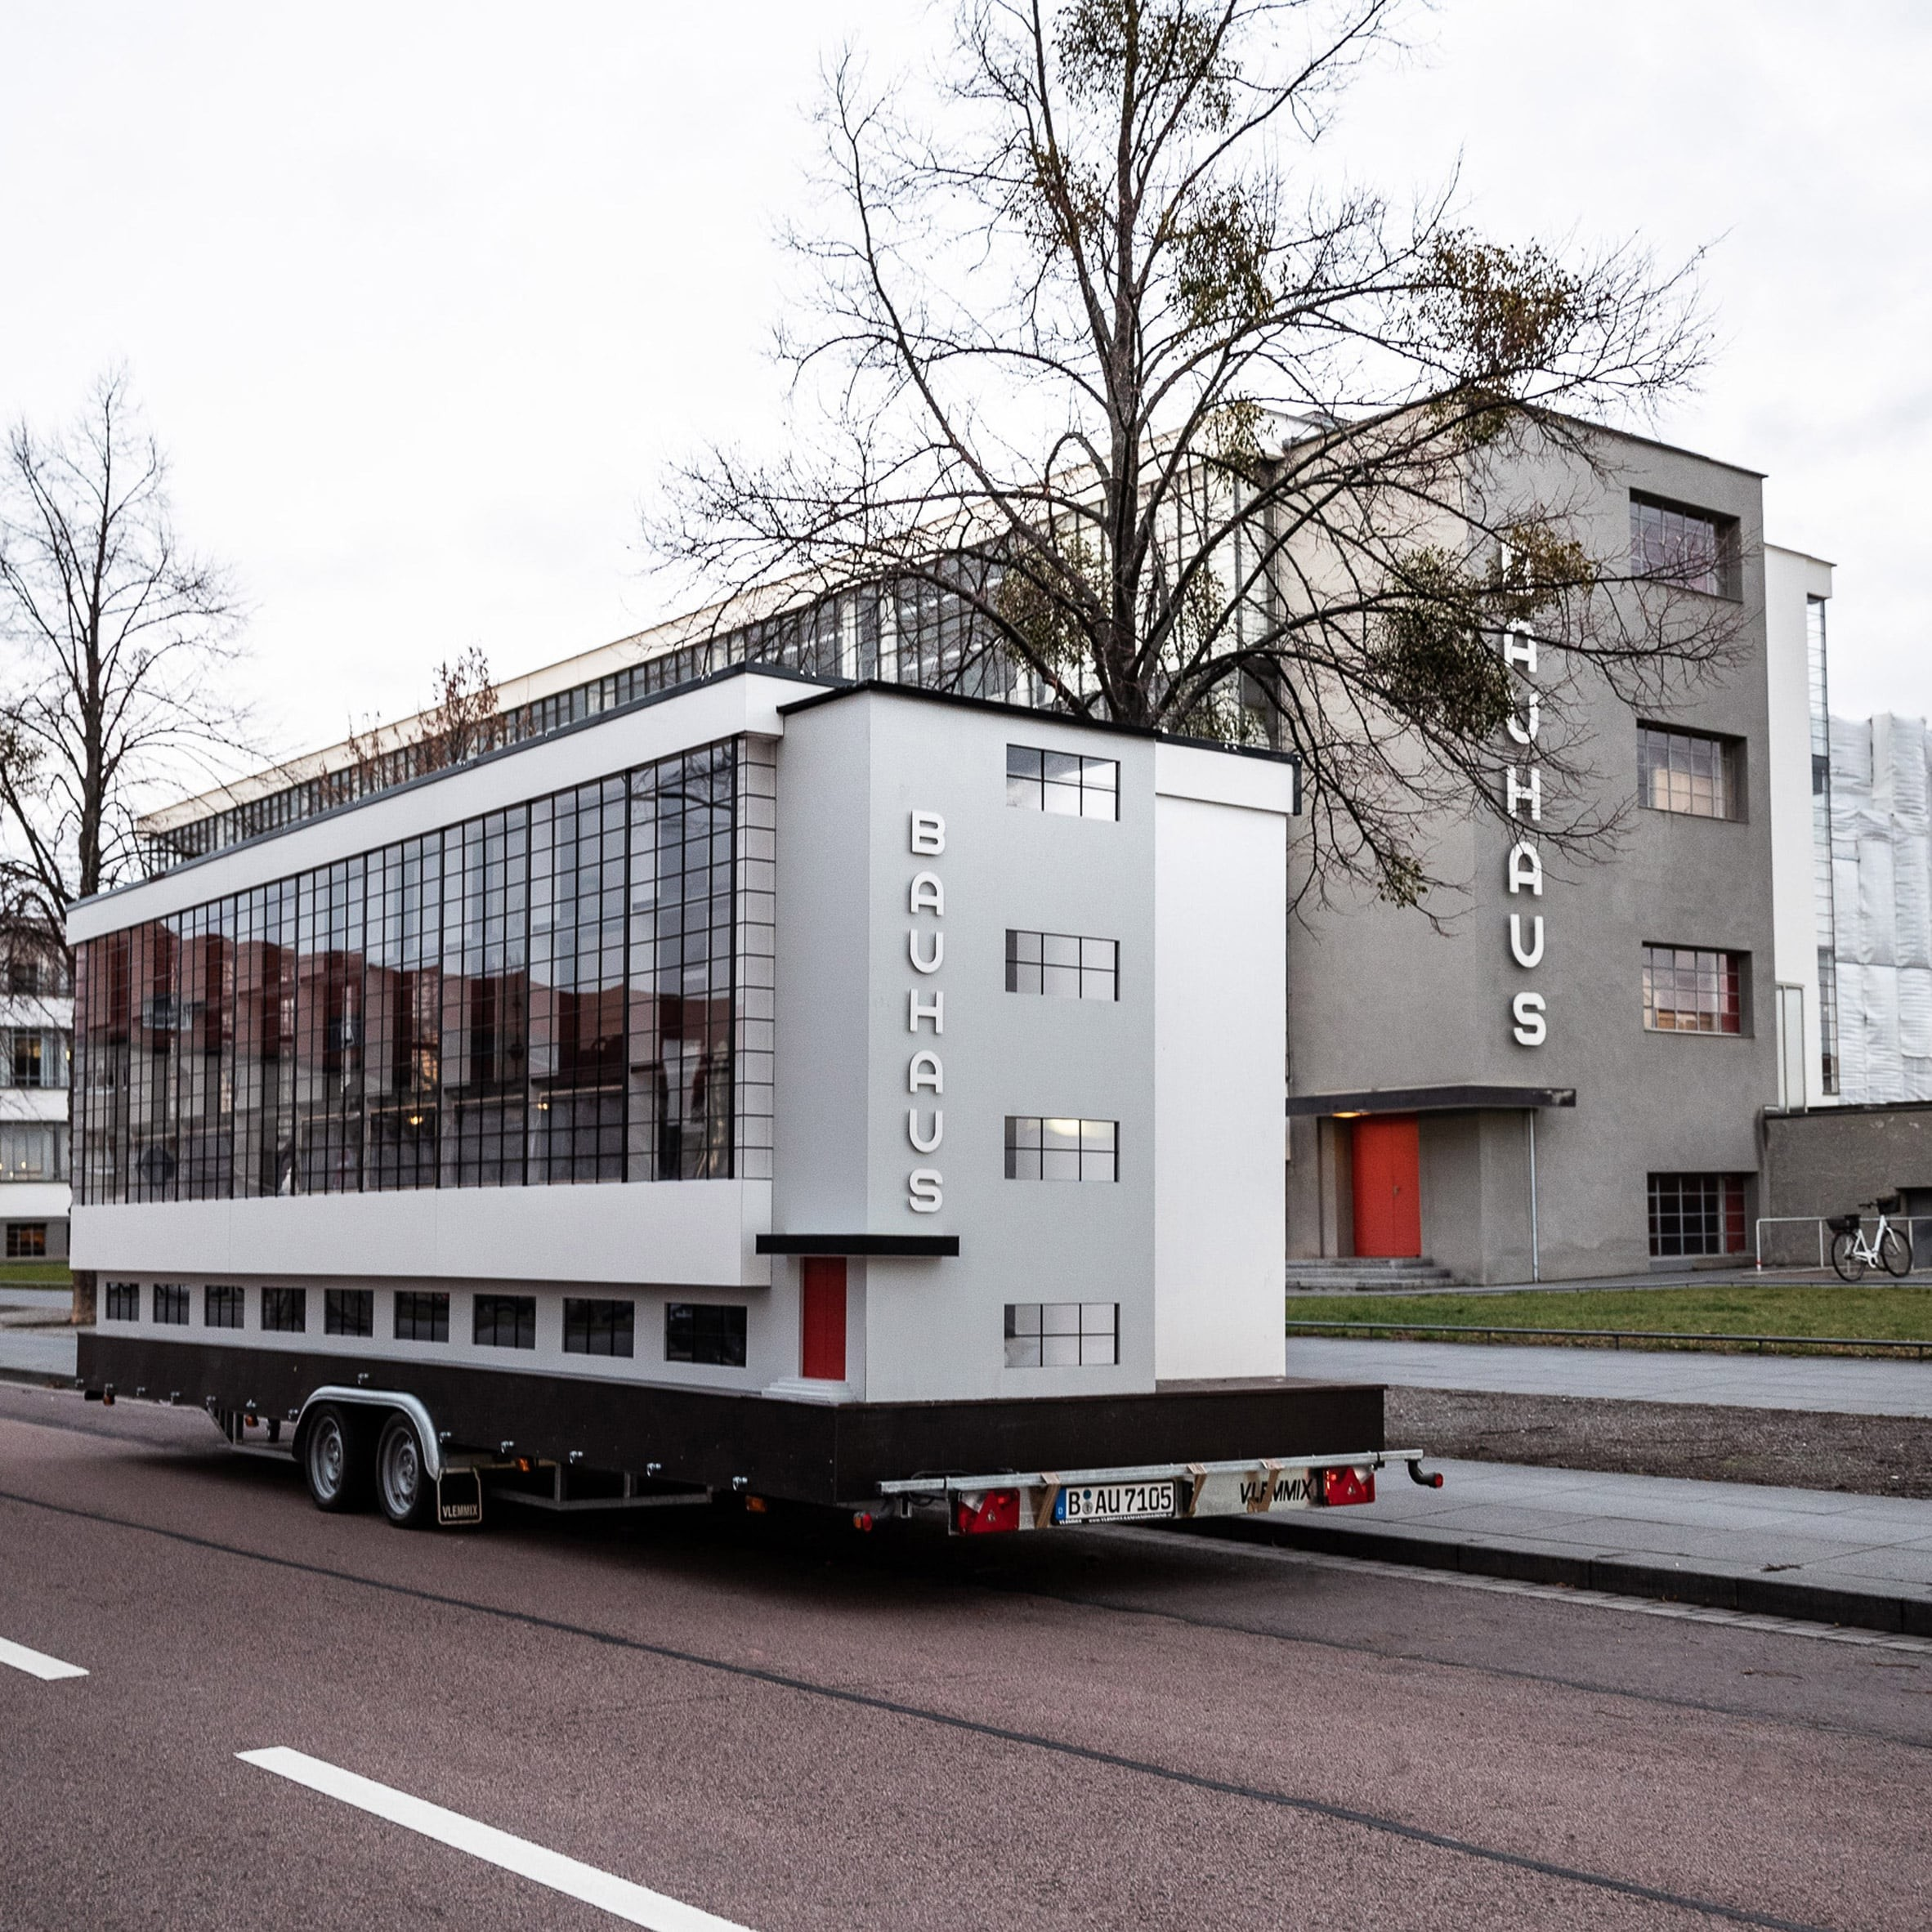 Bauhaus, Dessau, Bauhaus Archive, Design, Architect, Architecture, Bauhaus Dessau, From Bauhaus to Our House, Art, Modern art, bauhaus, Transport, Motor vehicle, Architecture, Mode of transport, Vehicle, House, Property, Tree, Car, Building